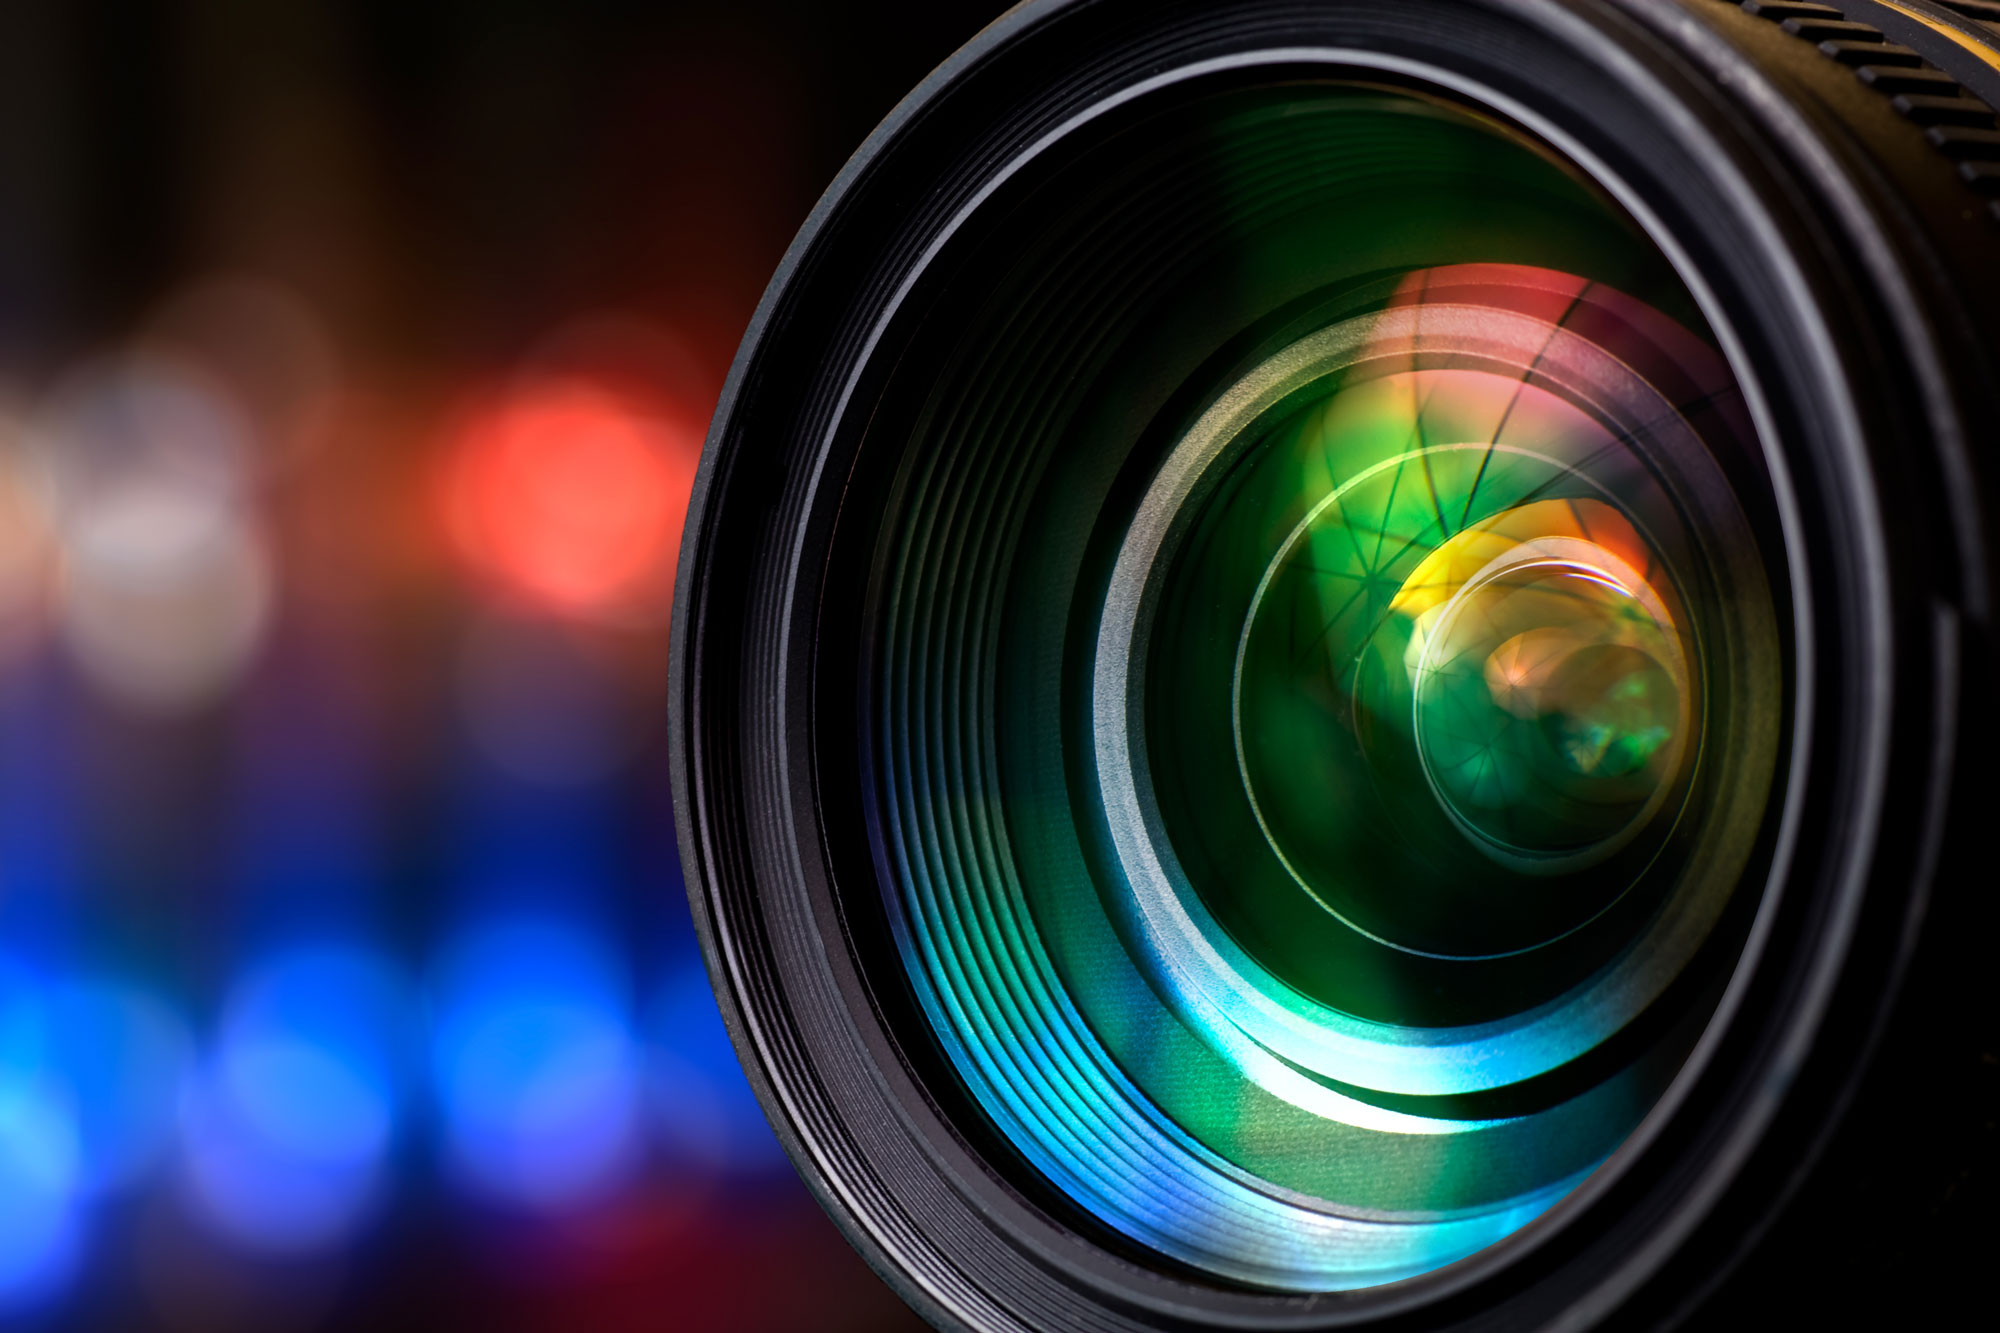 Объектив фотоаппарата картинка